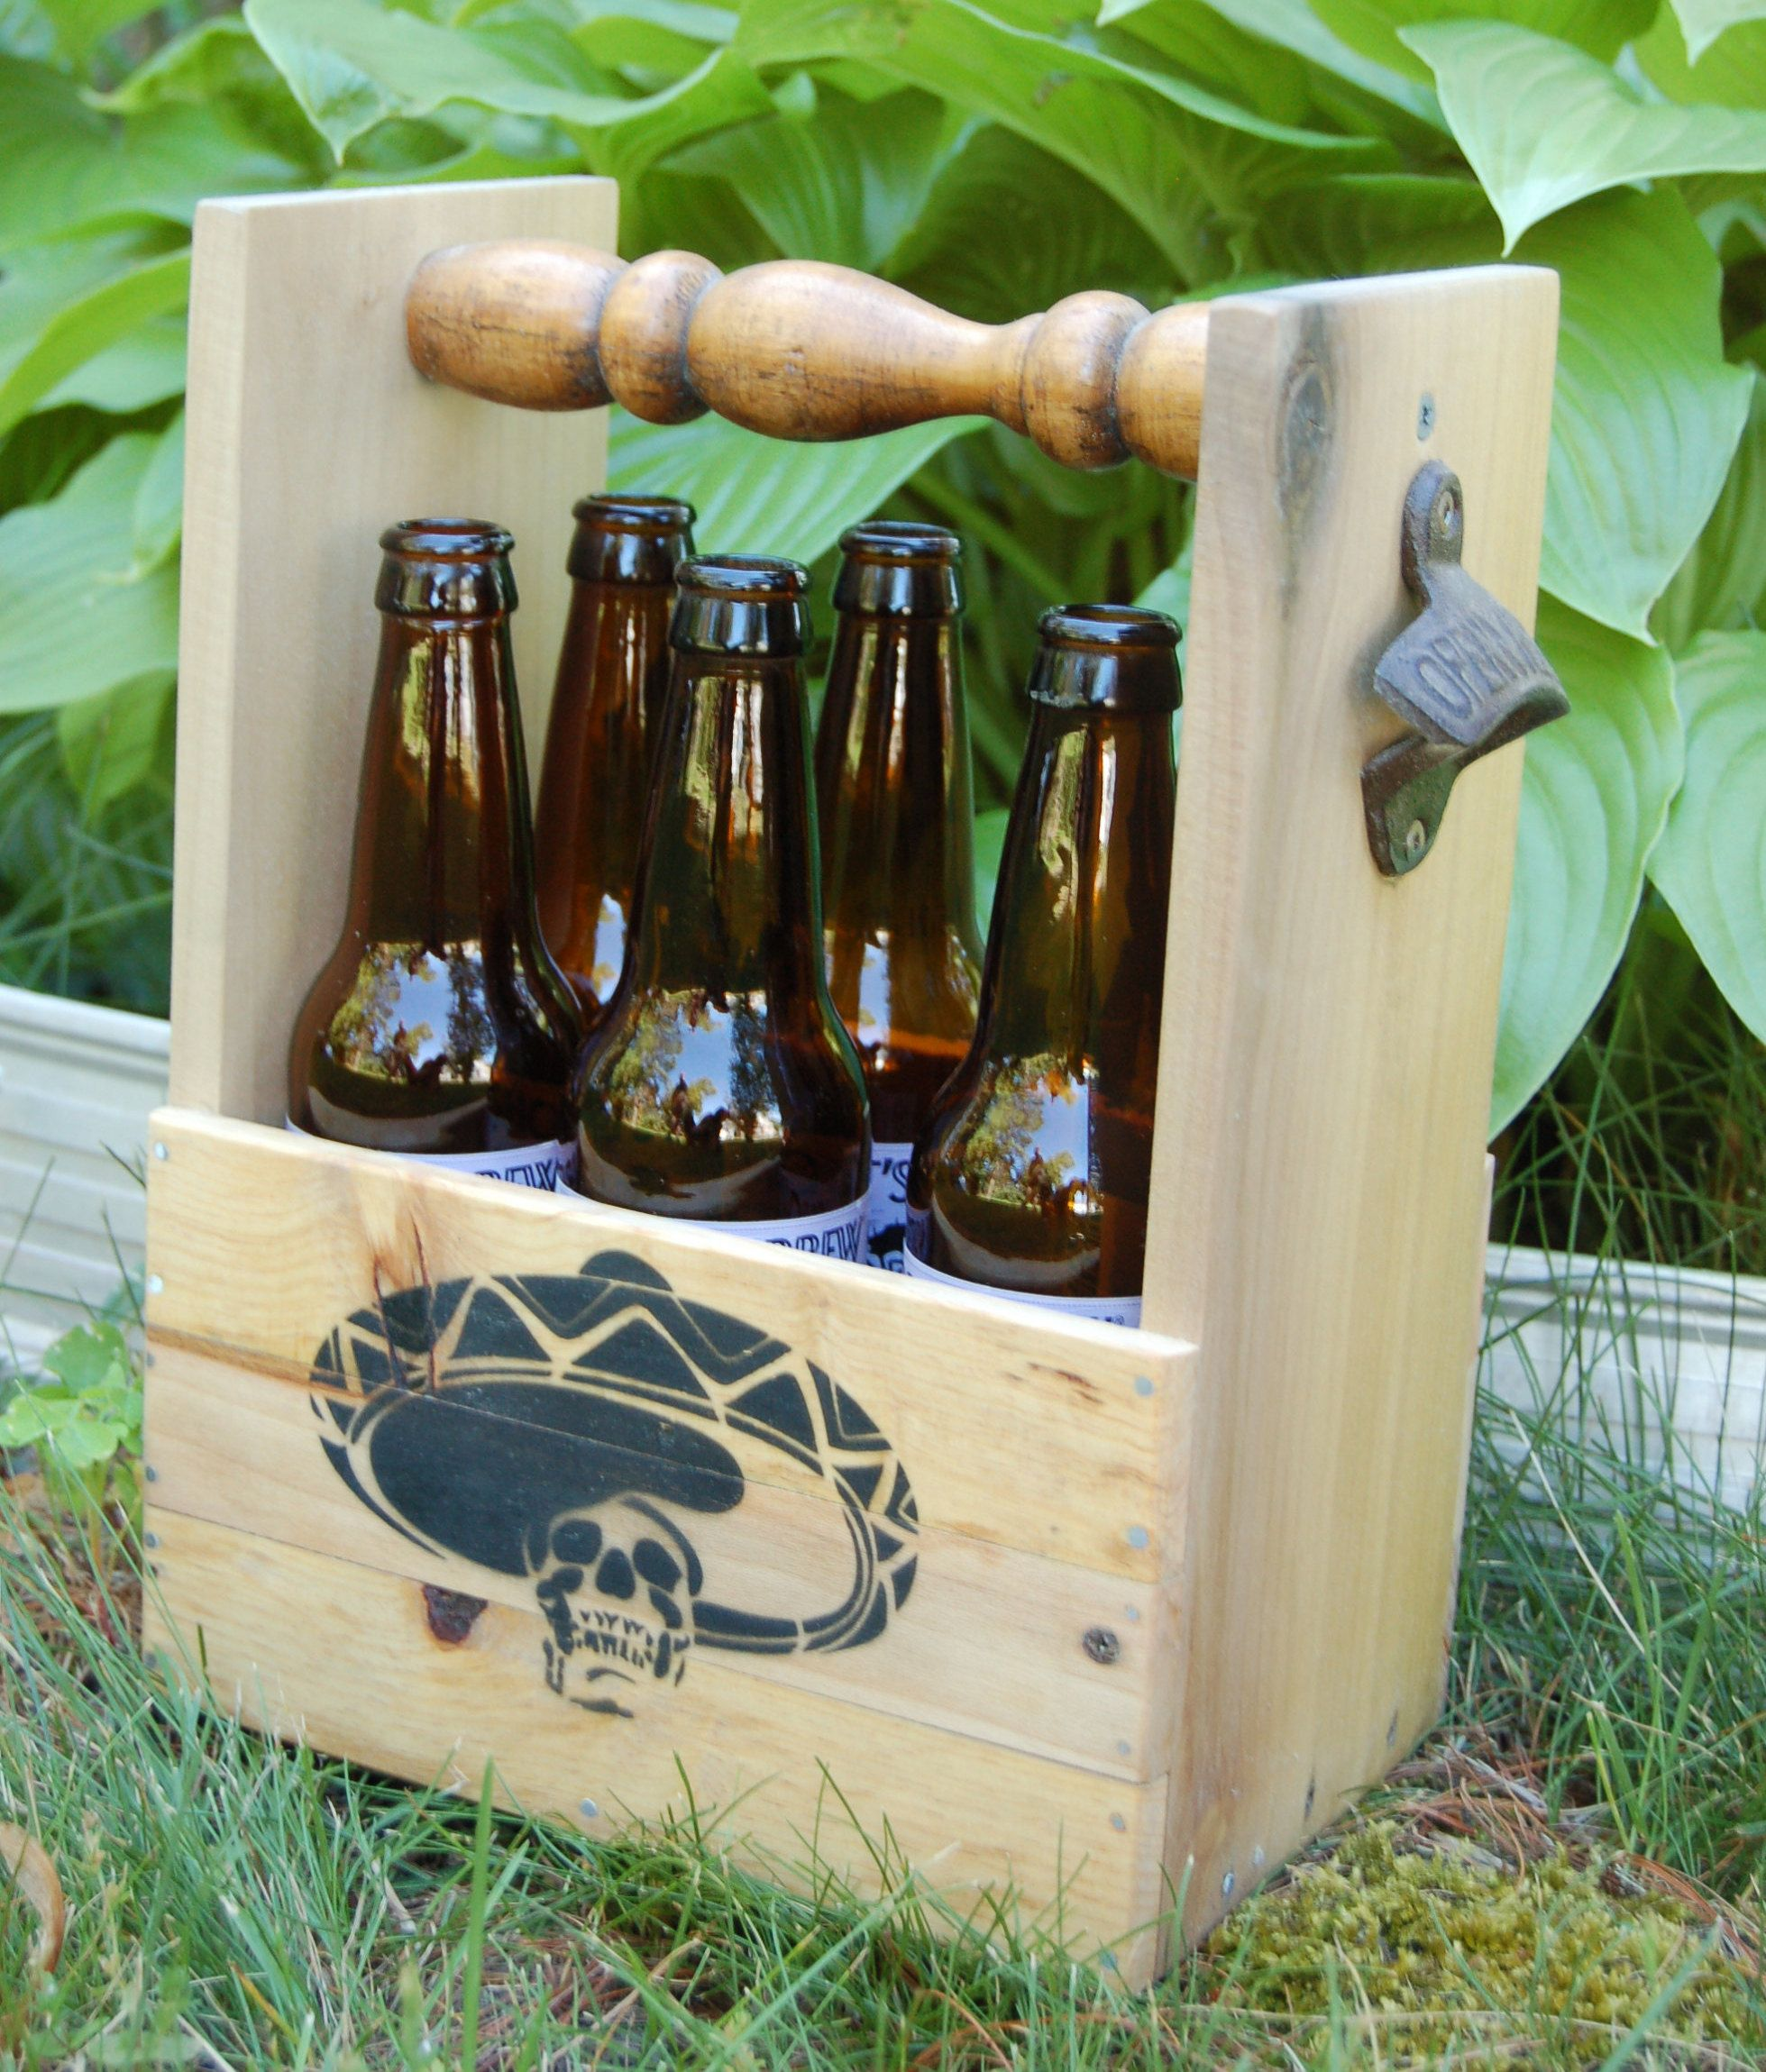 skull sombrero beer caddy six pack beer holder bottle carrier